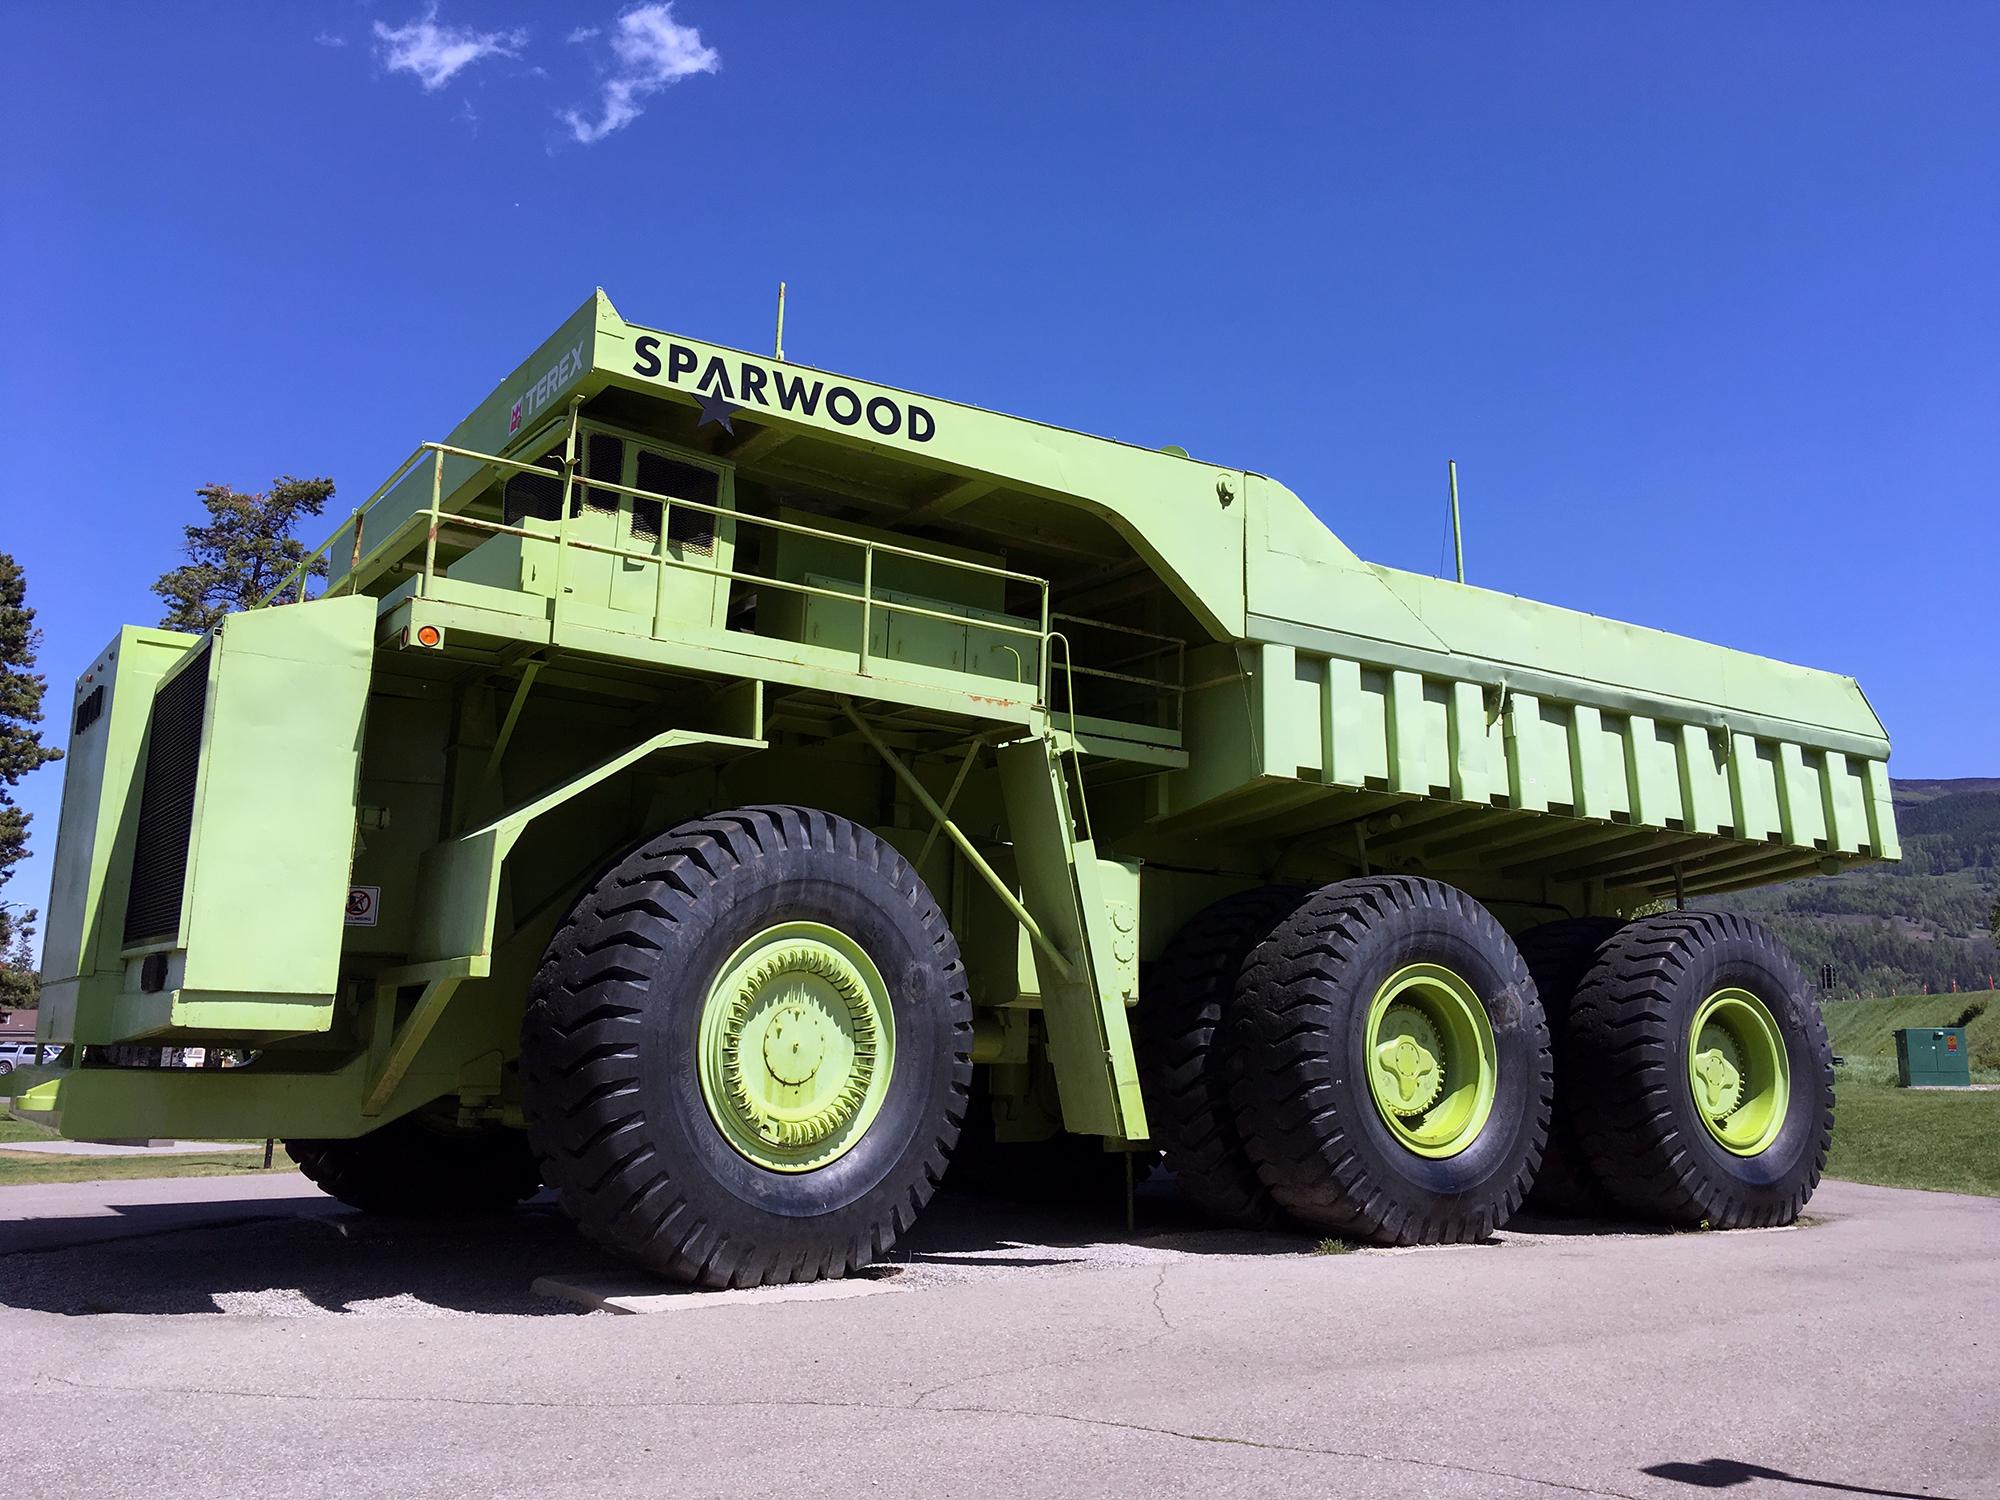 Generic Van Life - Crowsnest Highway Sparwood Truck